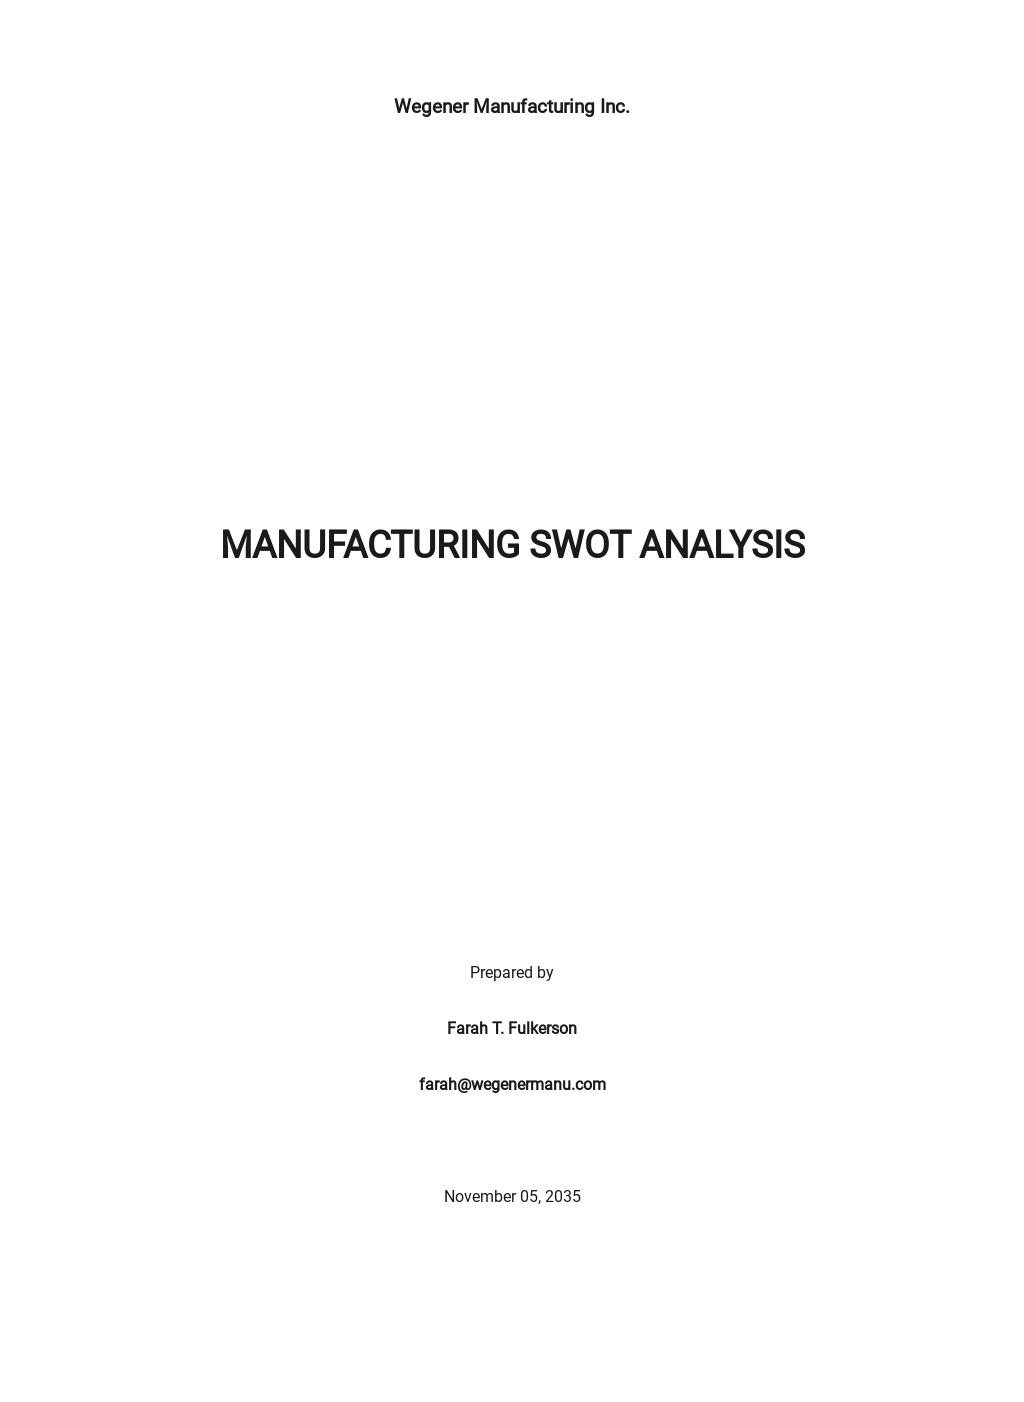 Manufacturing swot analysis template